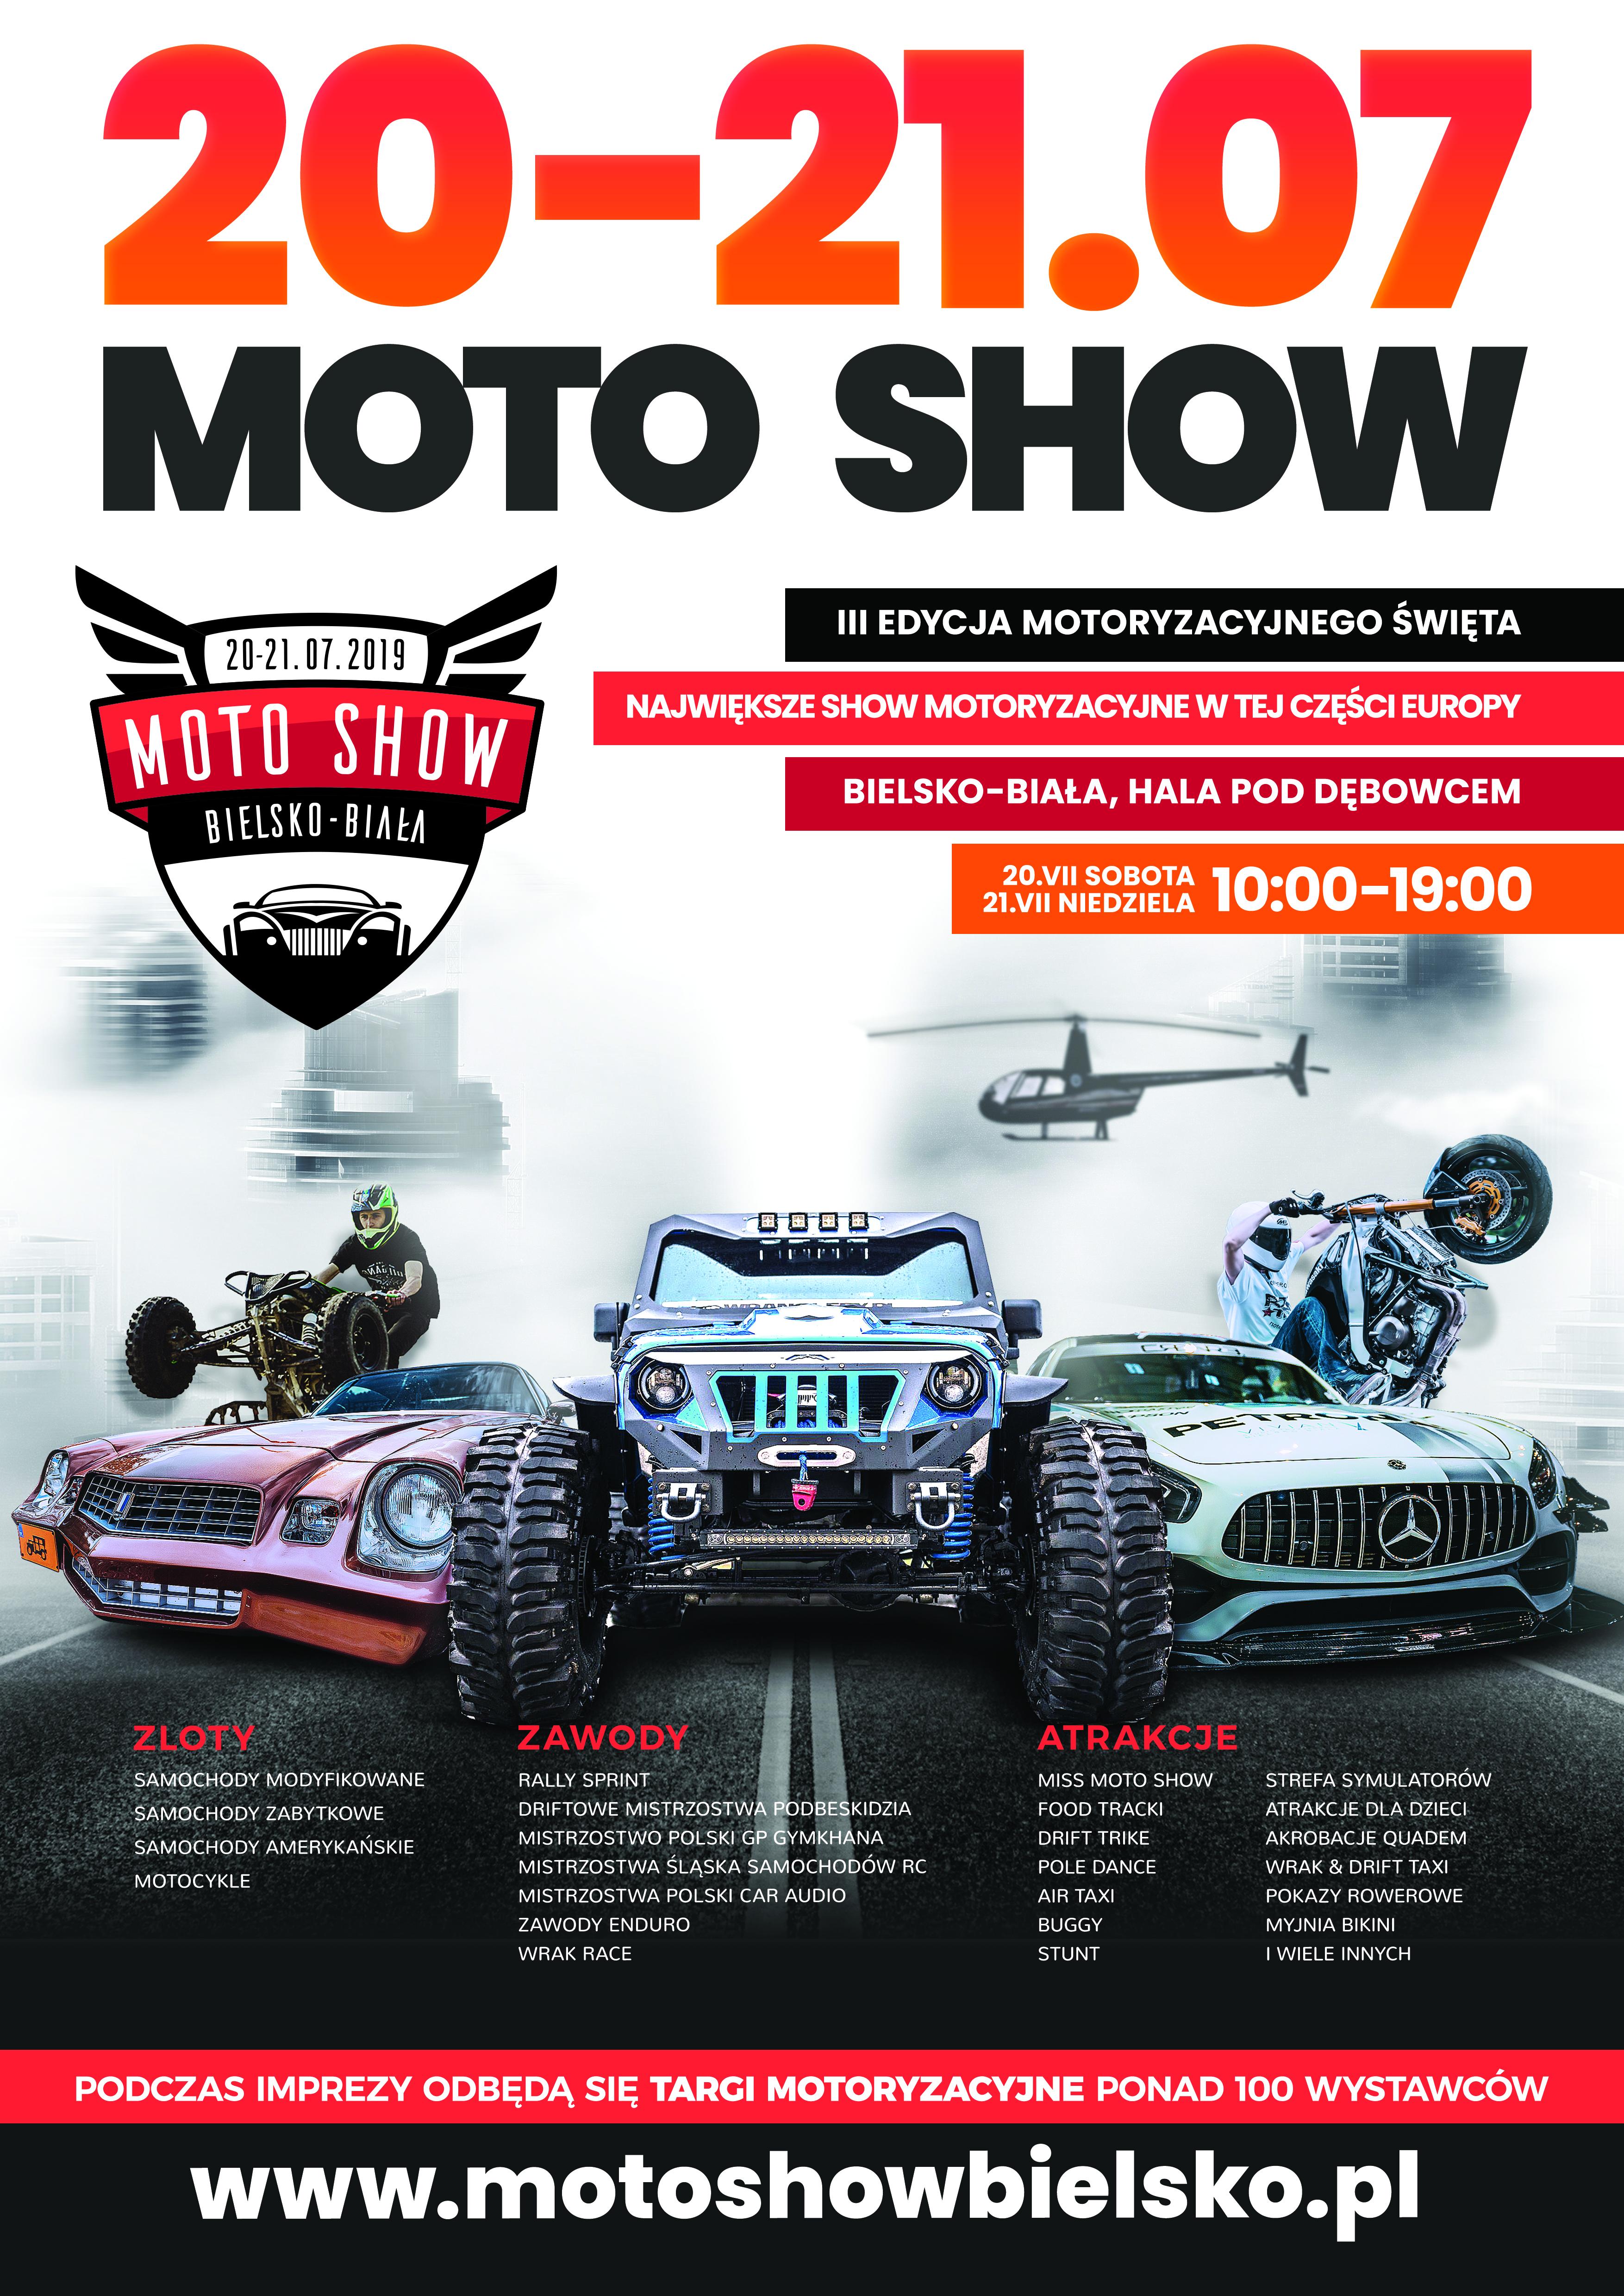 Moto Show Bielsko-Biała